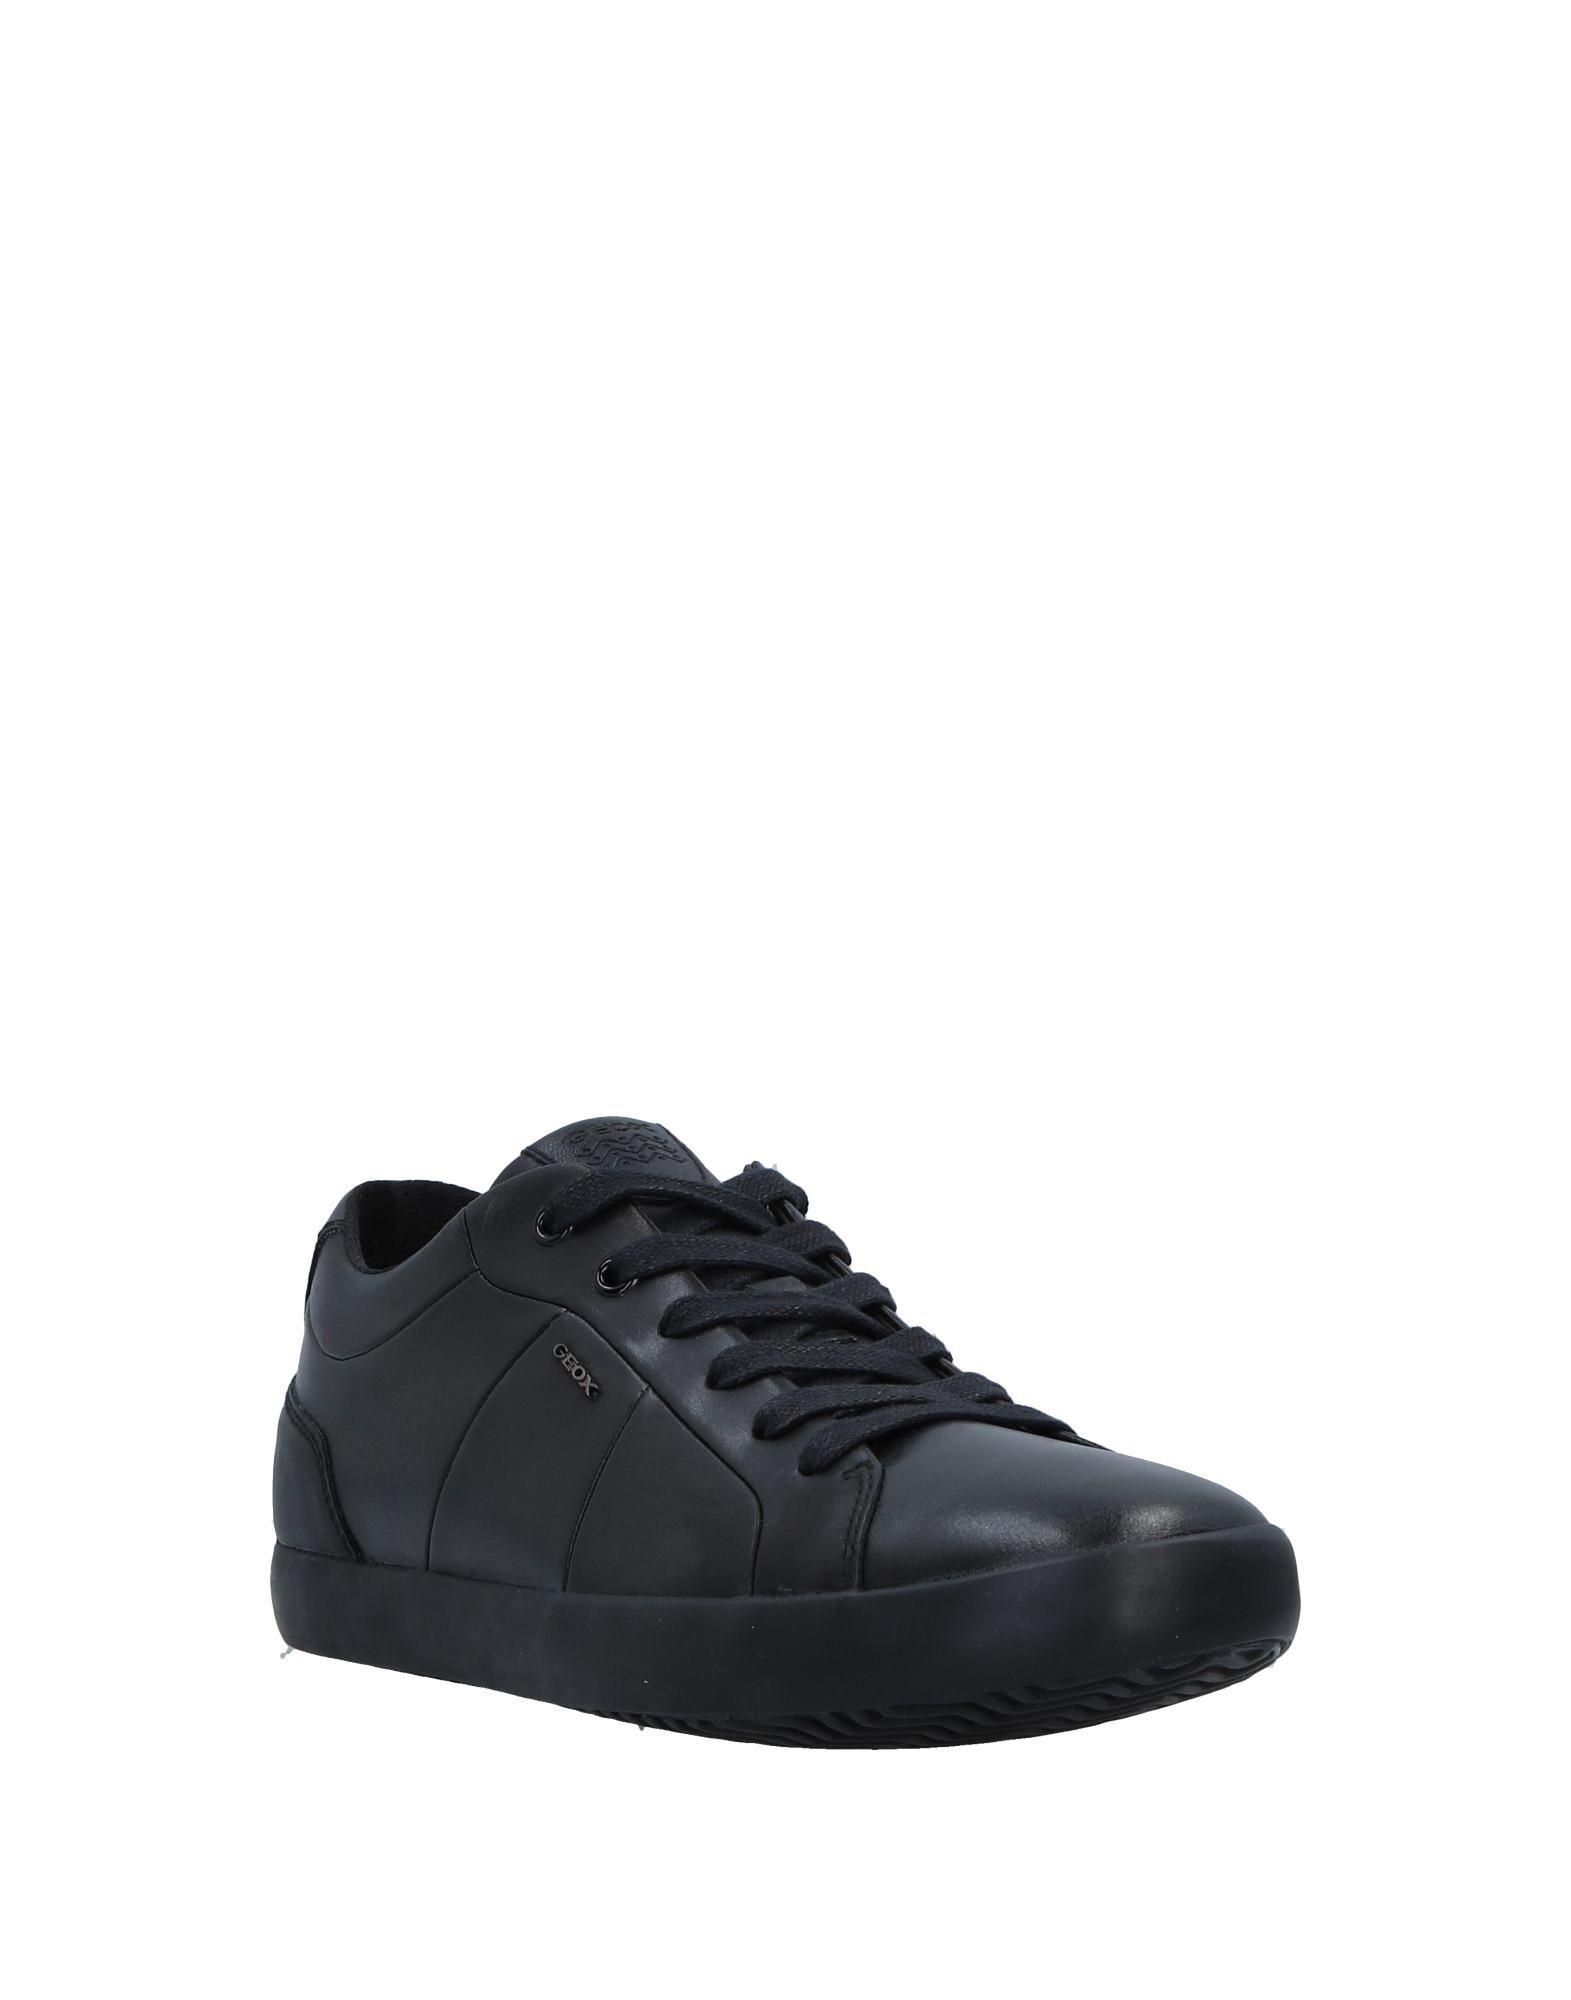 Geox  Sneakers Herren  Geox 11541008RN Heiße Schuhe cee368